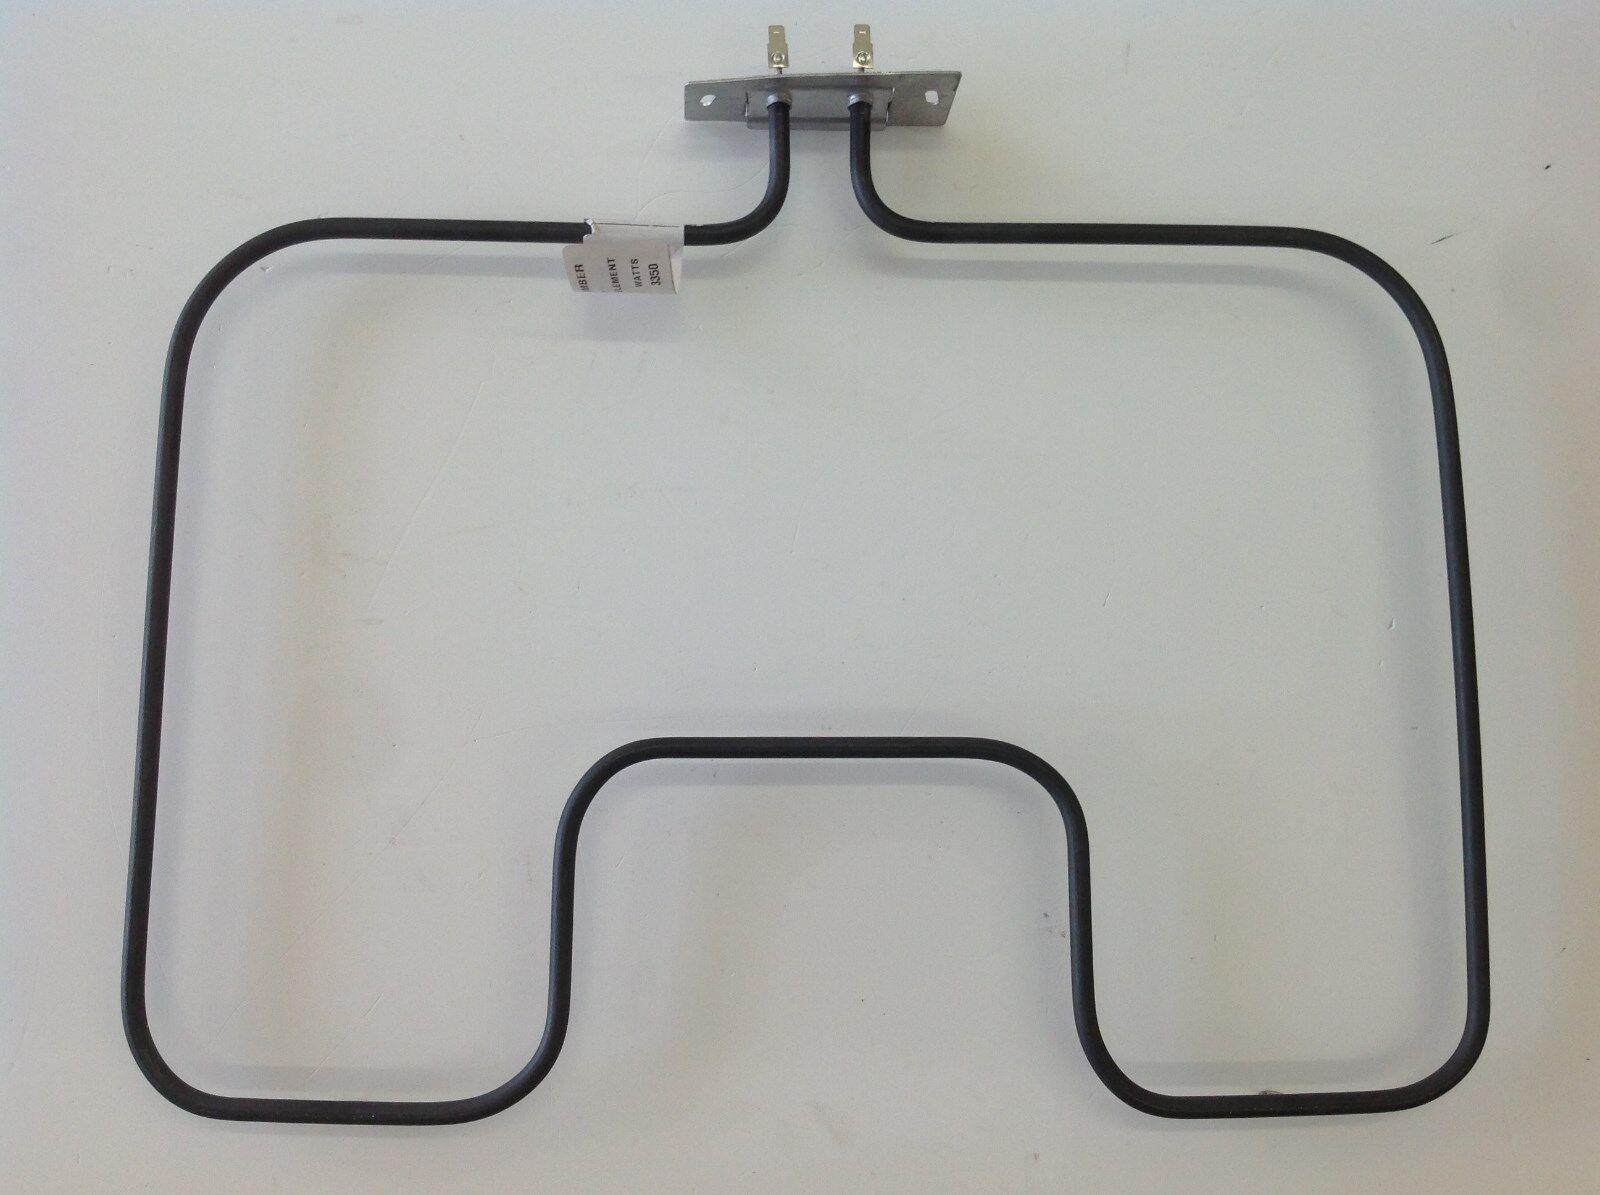 VINTAGE STOVE PARTS  Frigidaire Electric Range Oven Bake Ele